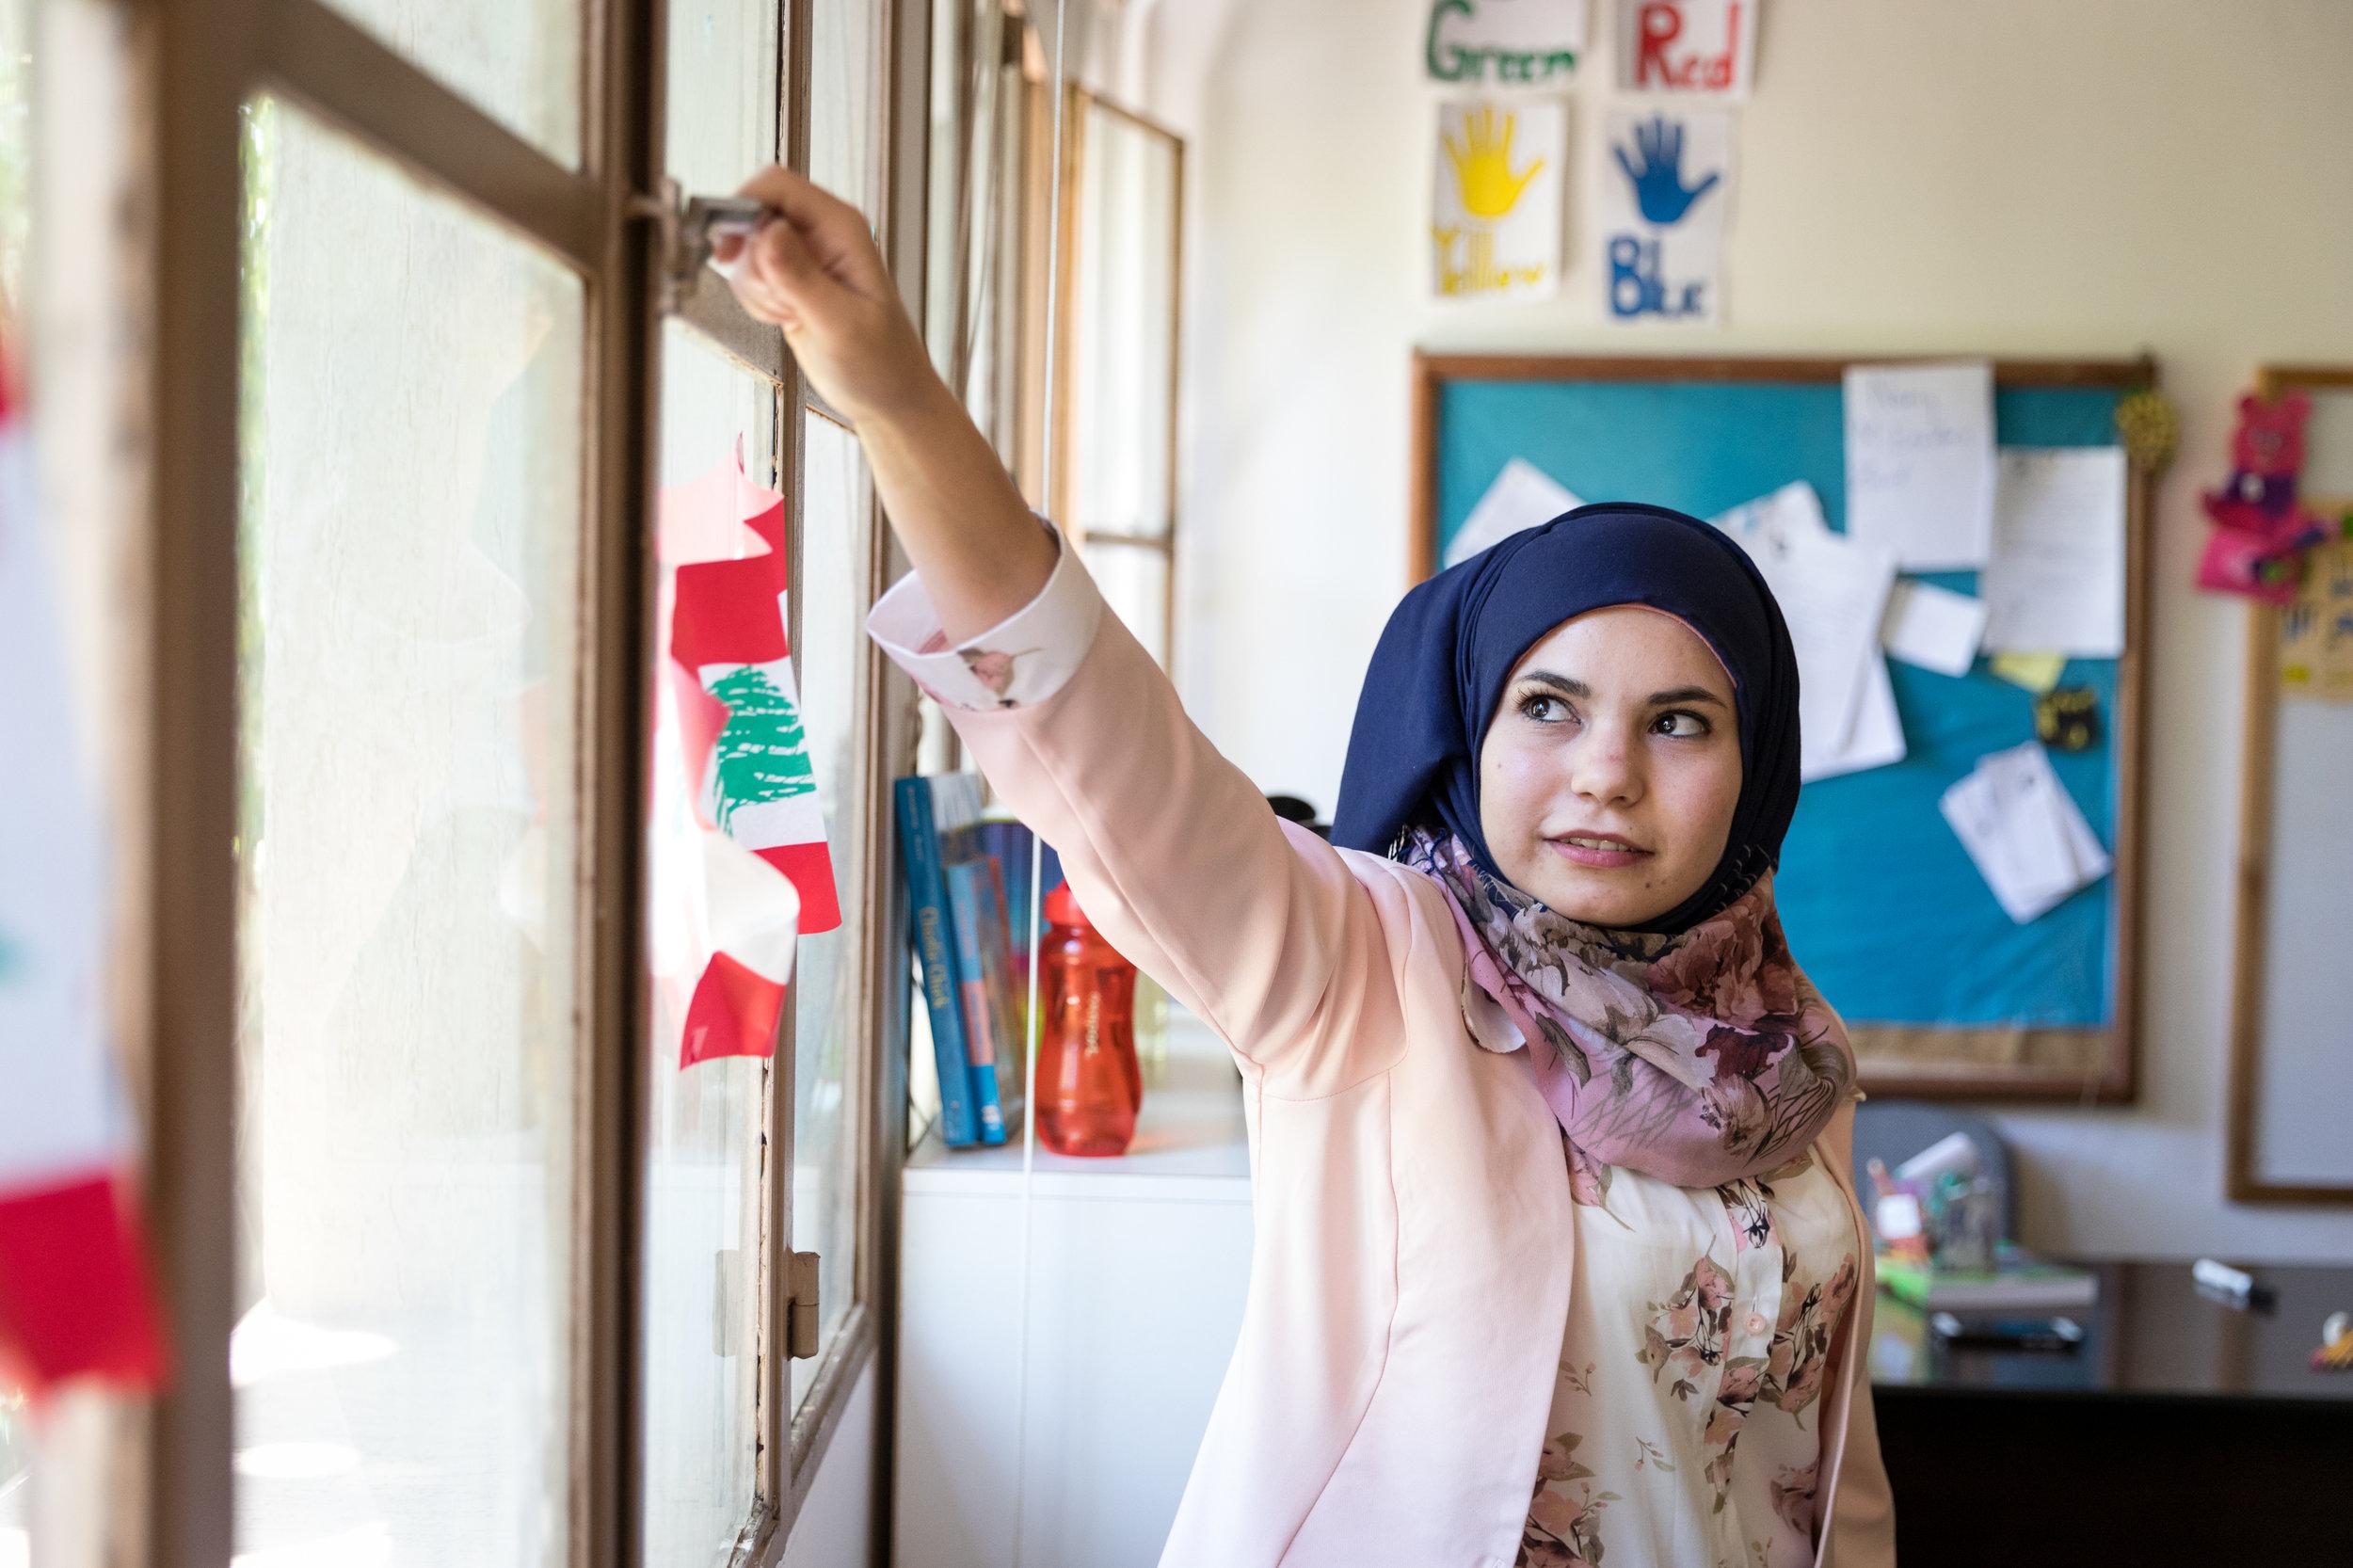 2018-06-20_Rasha Rafai 23, Childhood Education at Al Kayrawan, Bekaa, LEB_0314.jpg